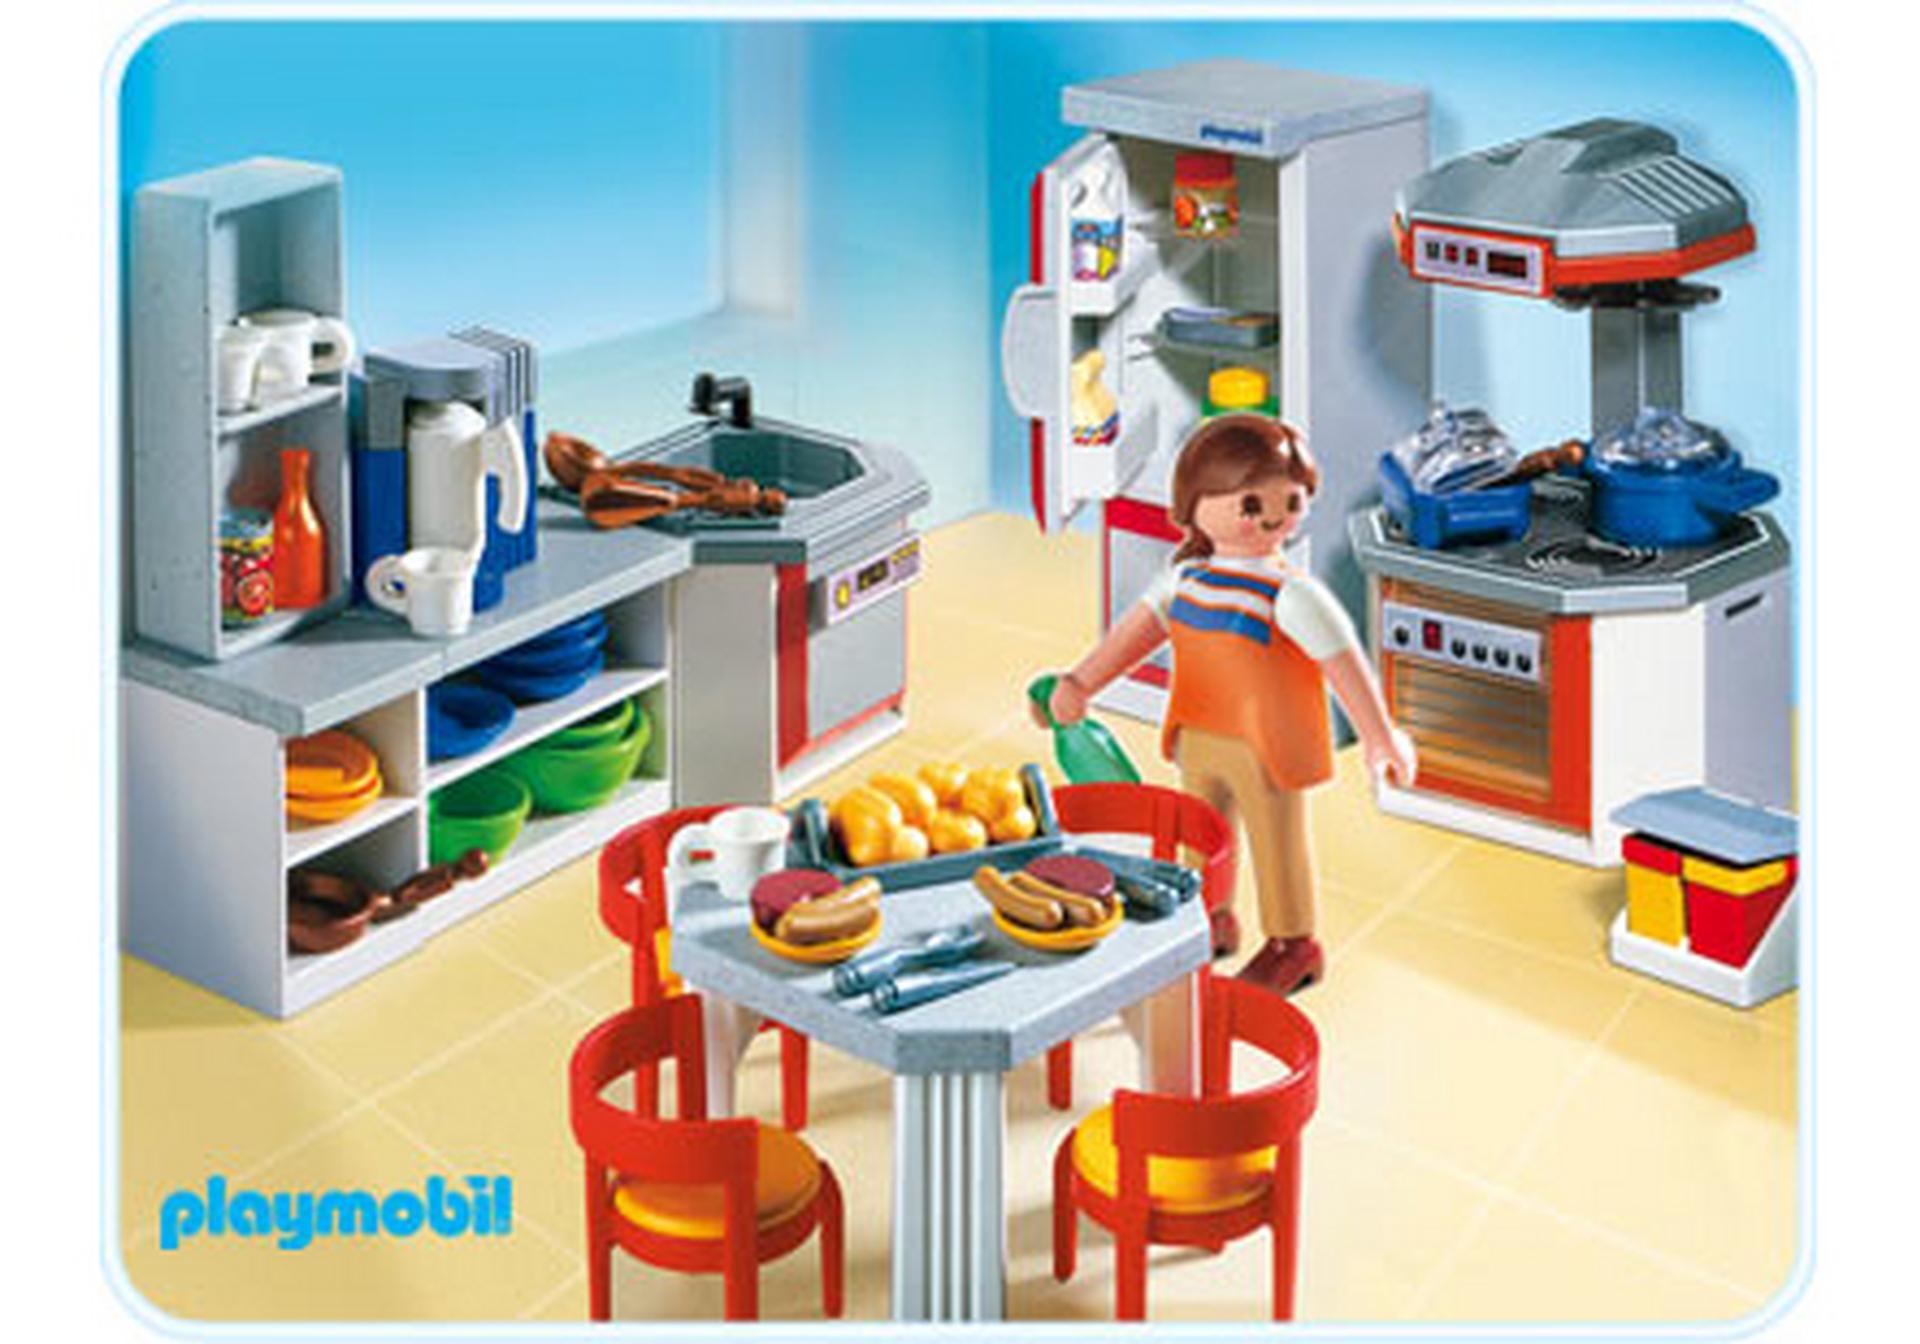 cuisine quip e 4283 a playmobil france. Black Bedroom Furniture Sets. Home Design Ideas